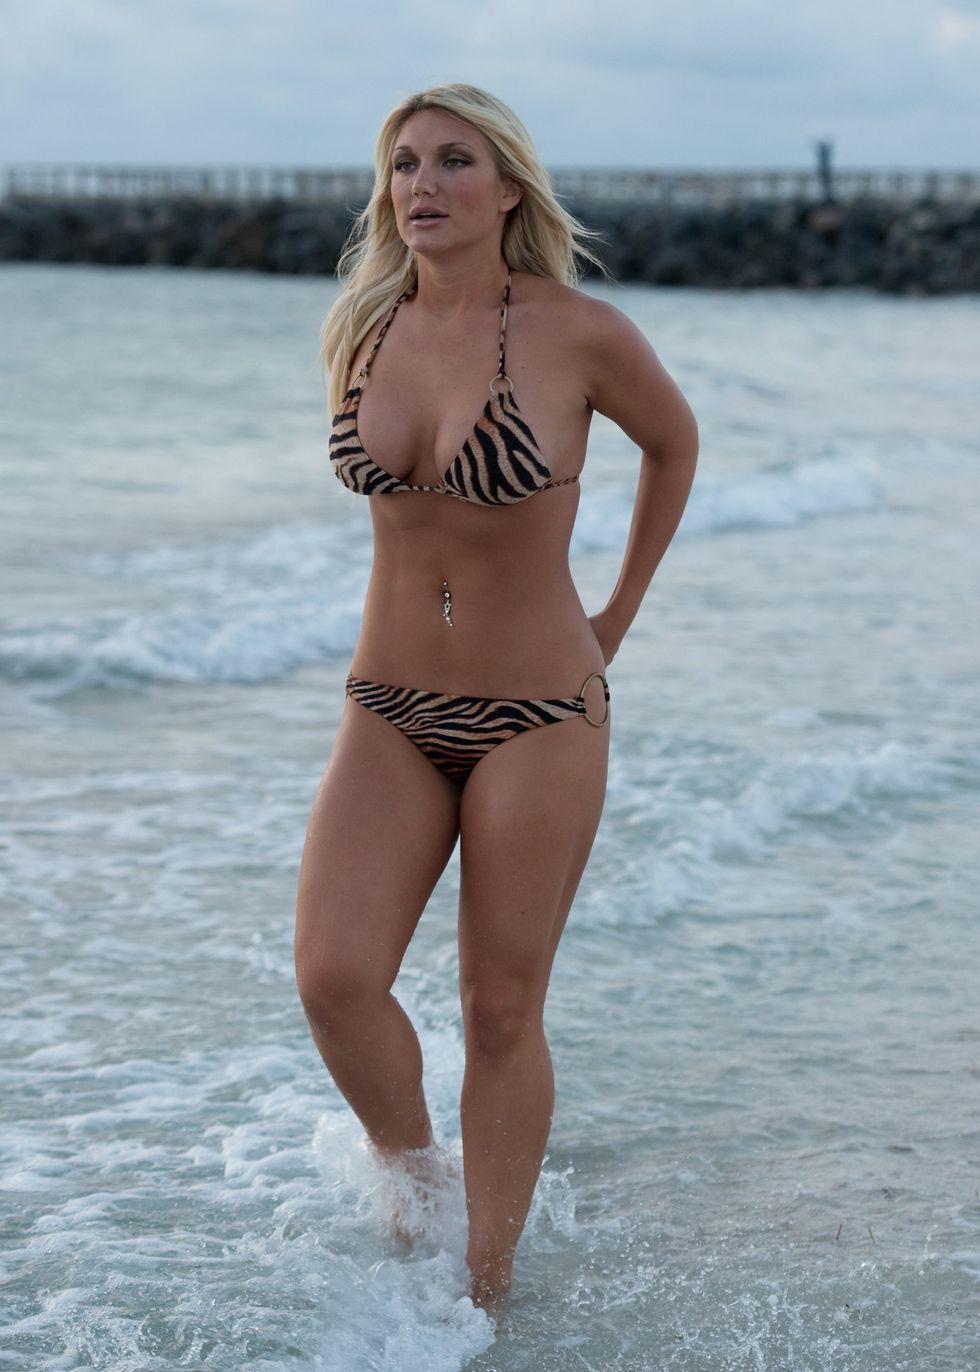 Paparazzi Ass Fiona Hogan  nudes (88 photos), Snapchat, see through